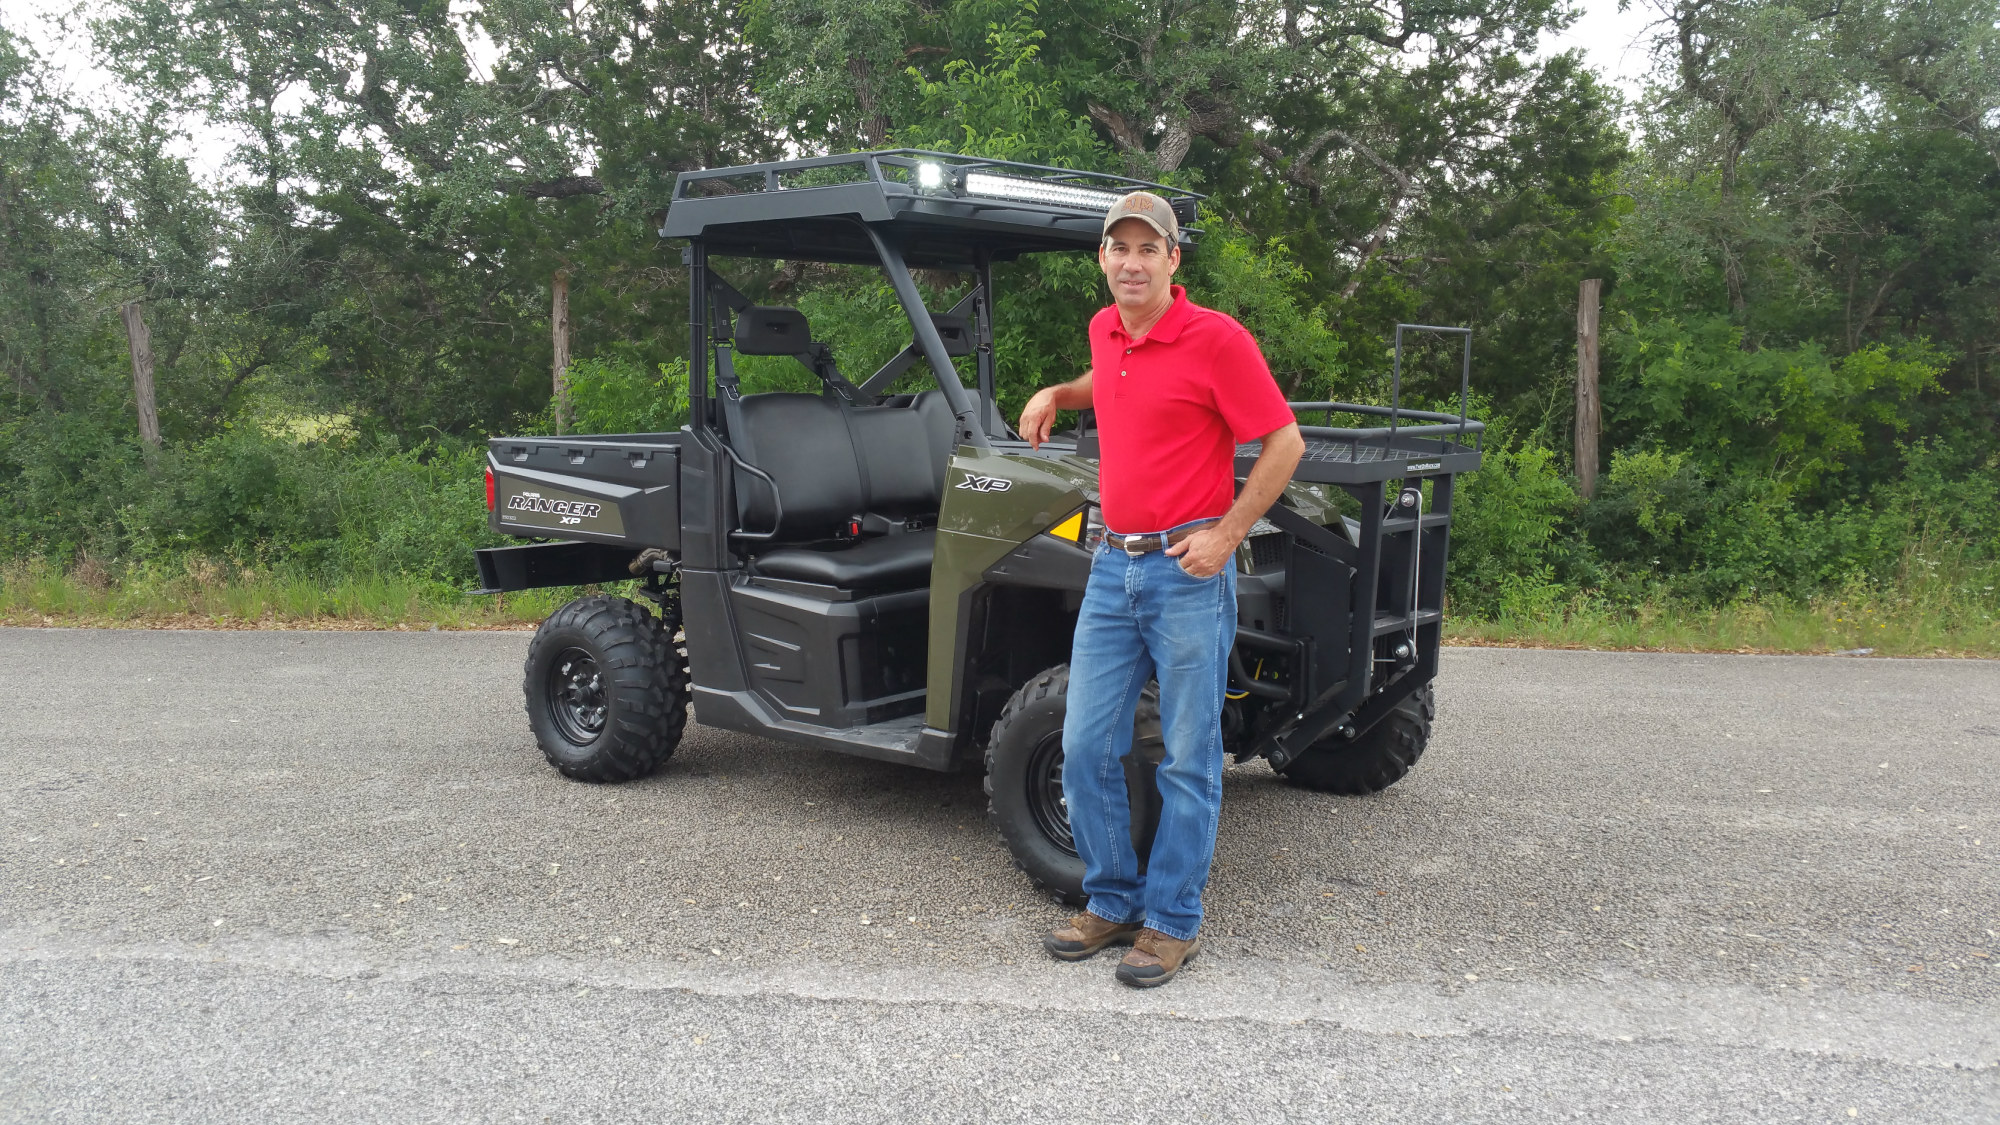 polaris-ranger-900-570-xp-single-cab-metal-top-and-rear-bumper.jpg